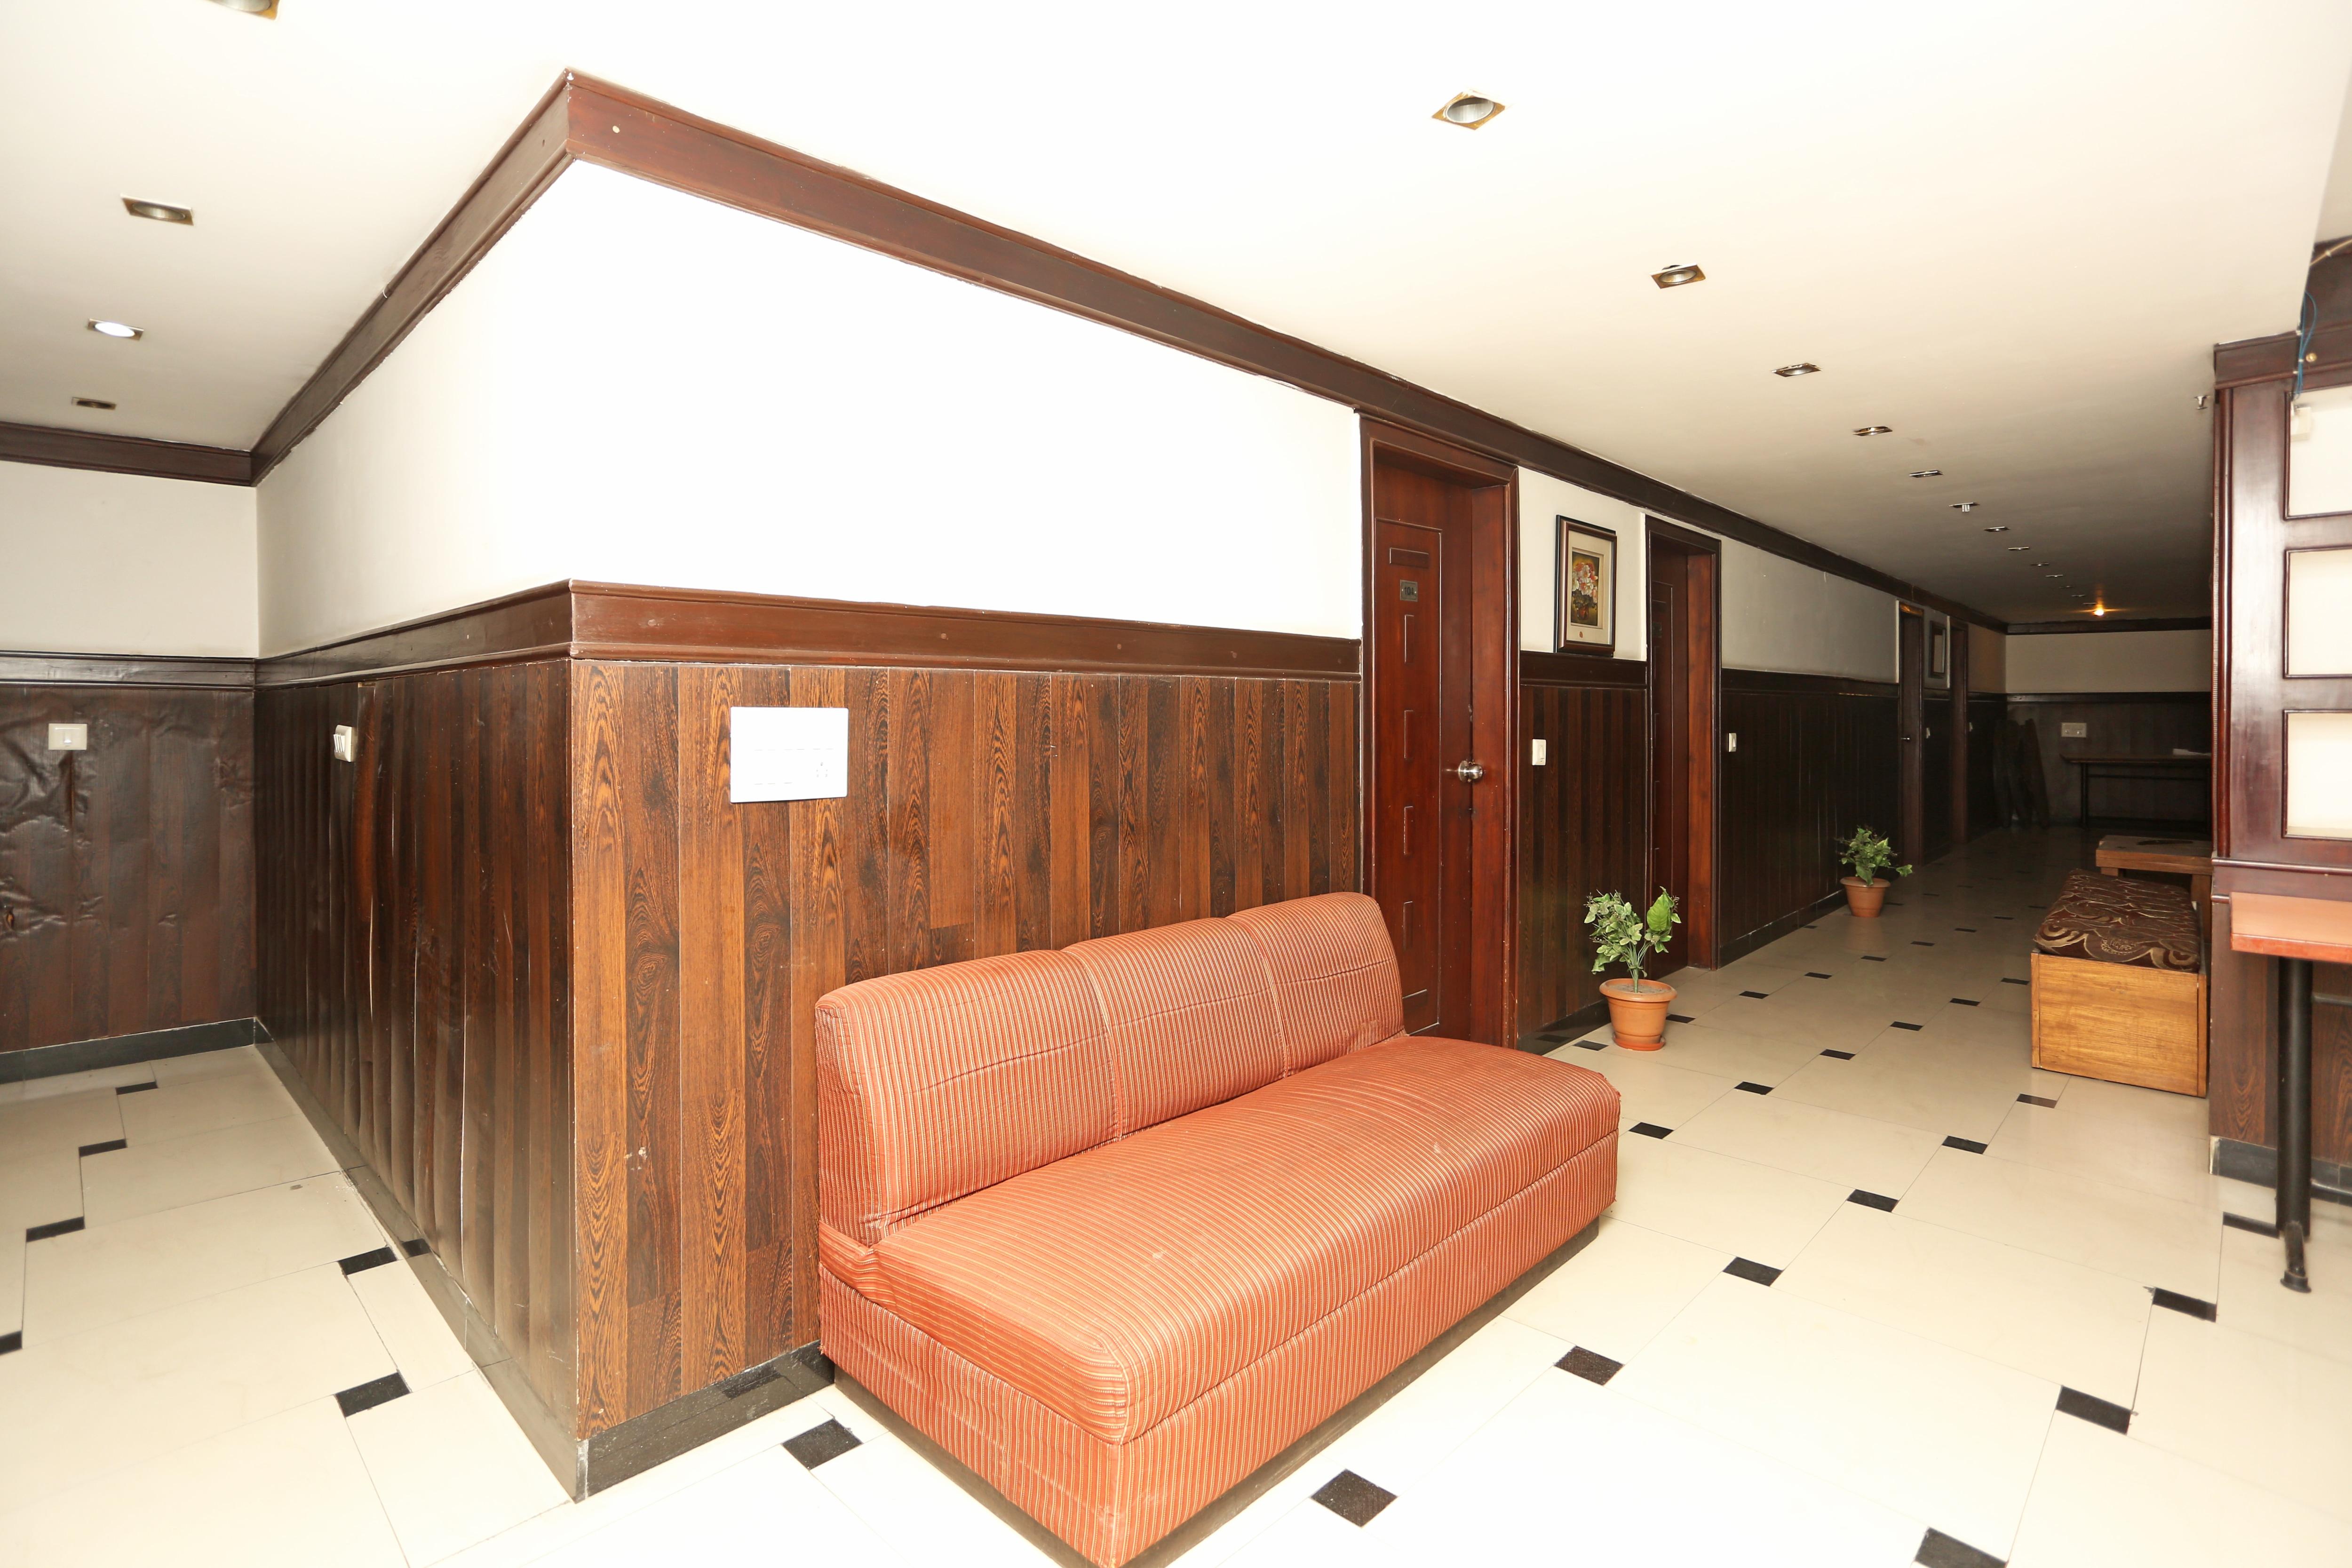 Oyo 8826 Hotel City Garden Ghaziabad Hotel Booking - Reviews, Room ...